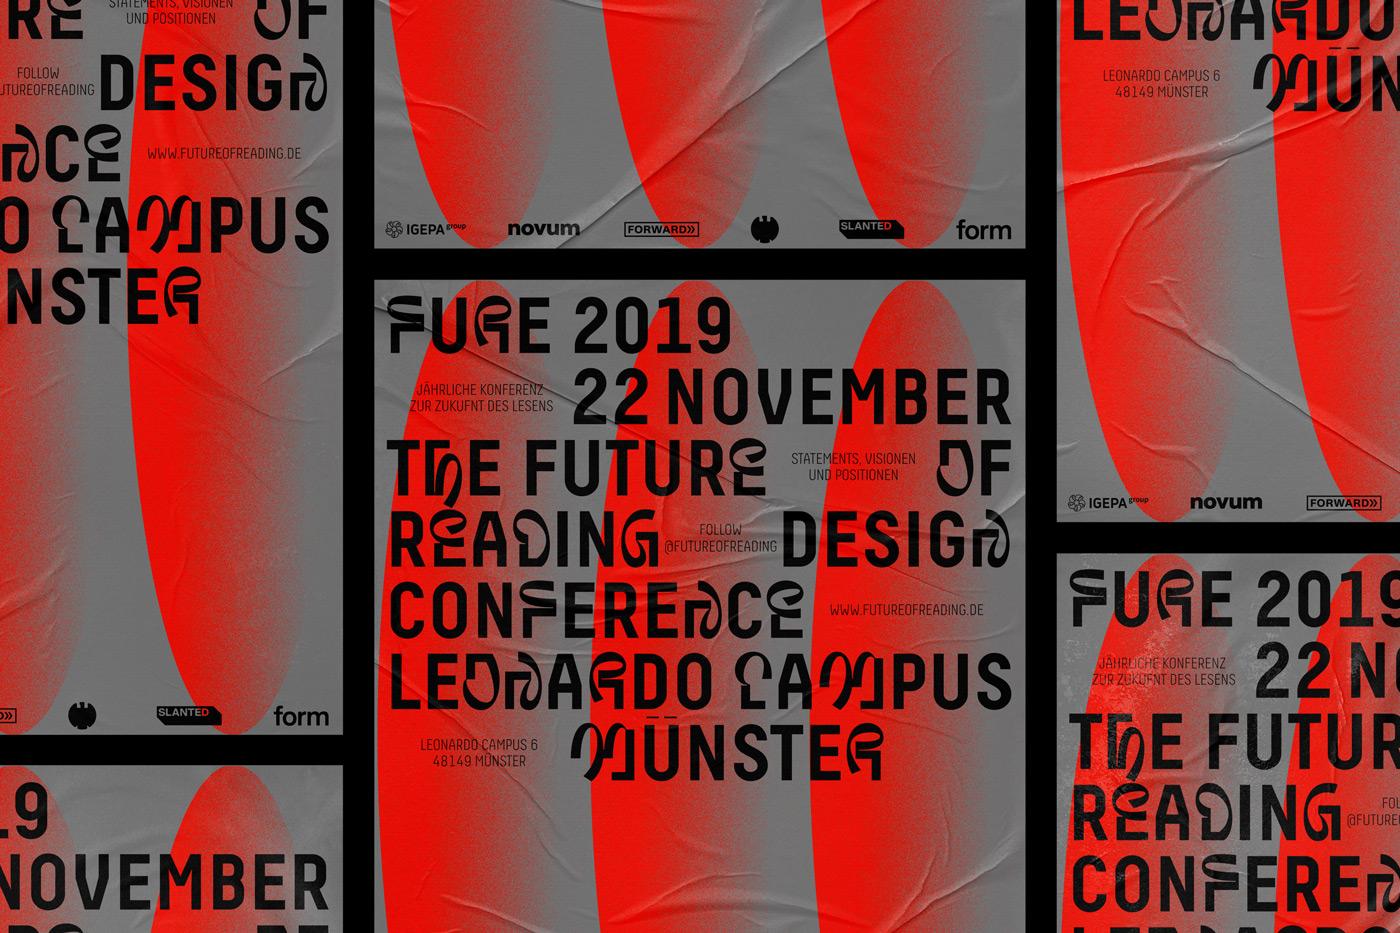 FURE 2019 Design Conference